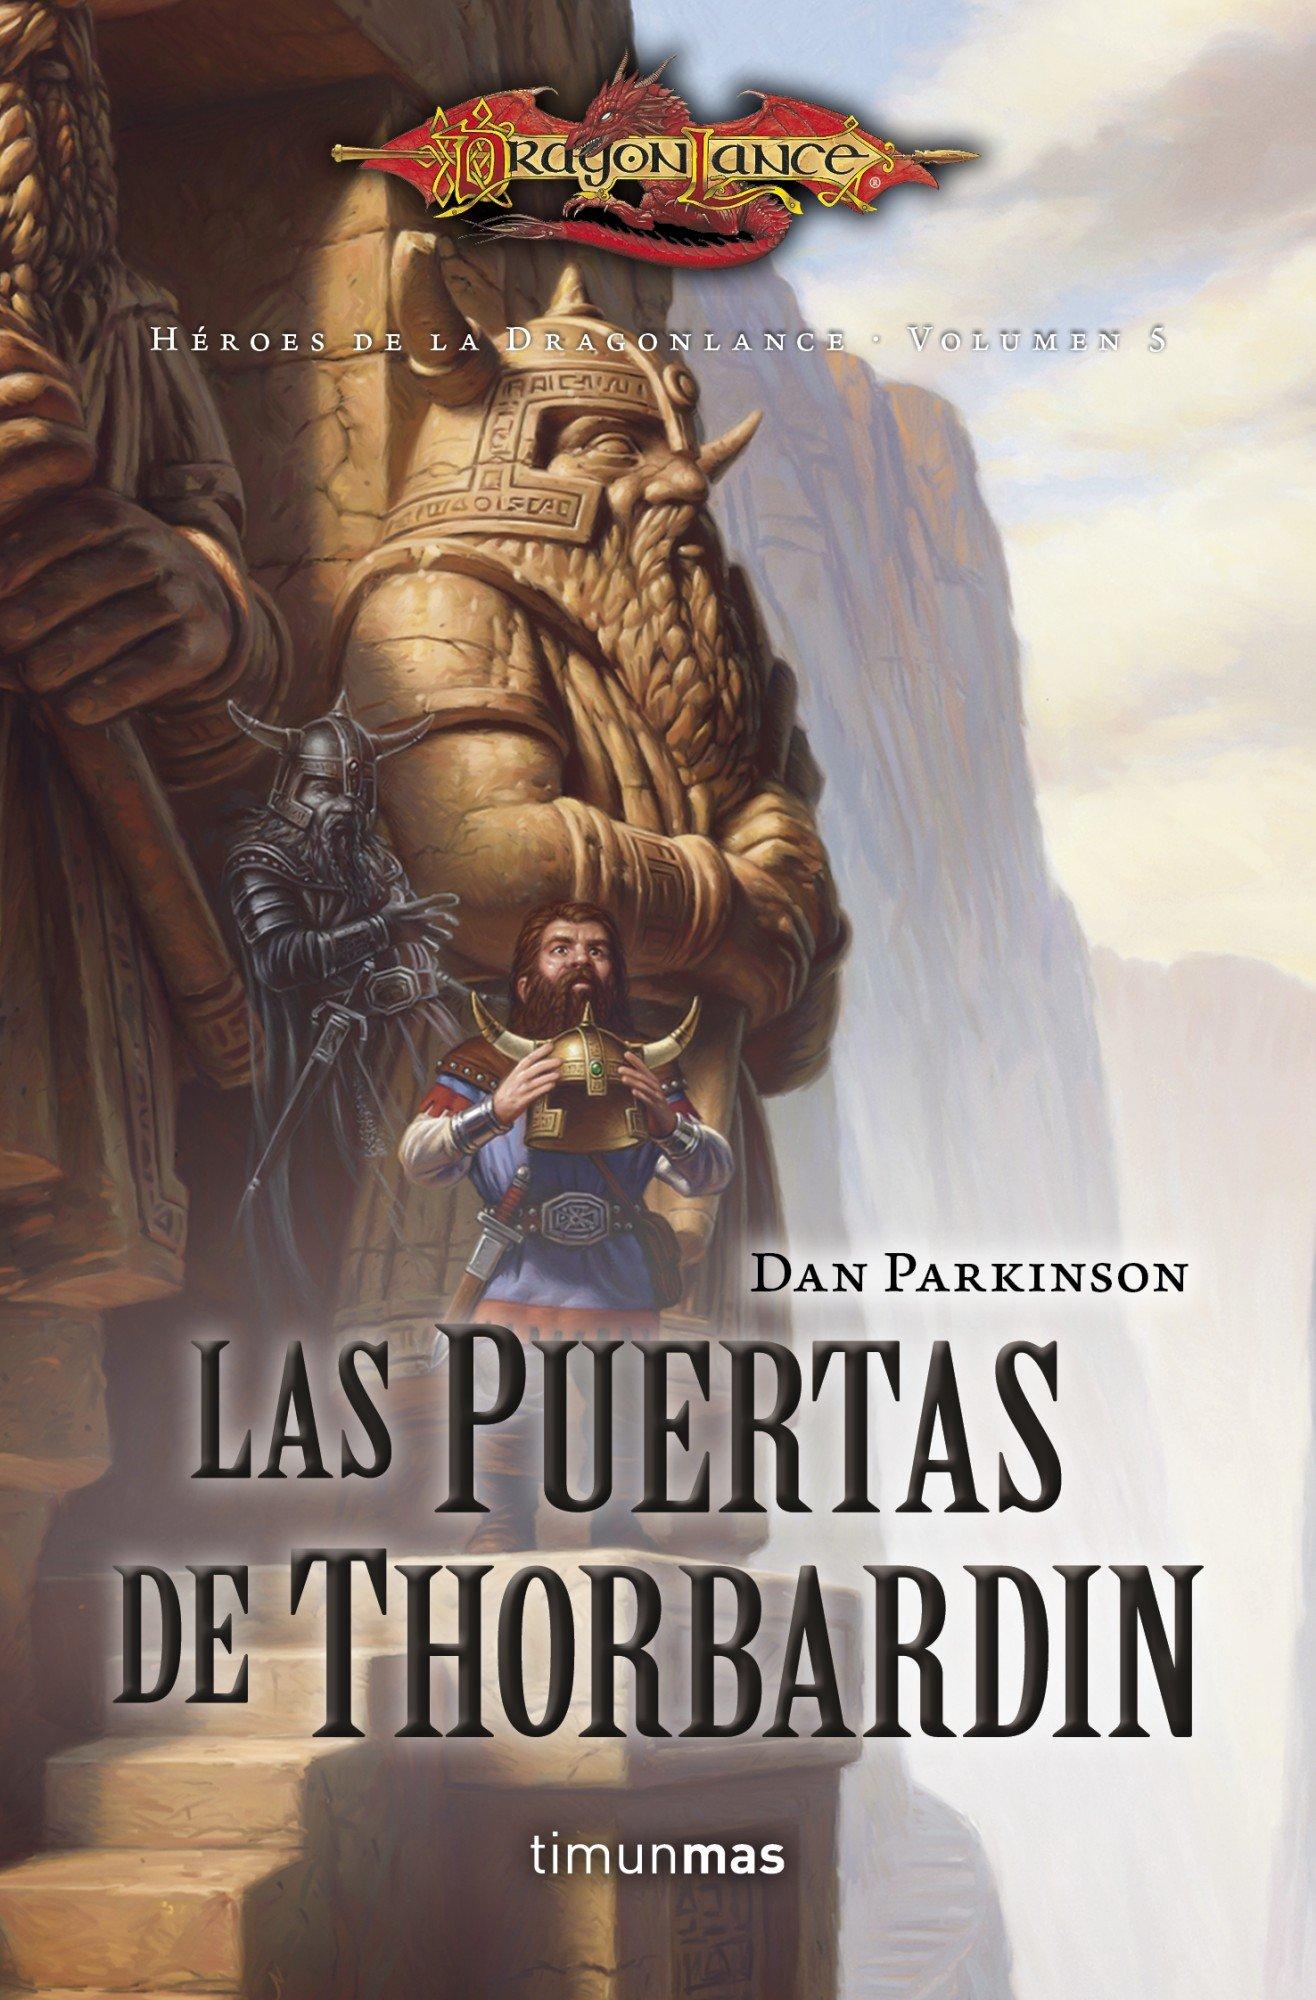 Las puertas de Thorbardin: Héroes de la rangonlance. Volumen 5 (Dragonlance) Tapa blanda – 25 sep 2012 Dan Parkinson Herminia Dauer Timun Mas Narrativa 8448006798